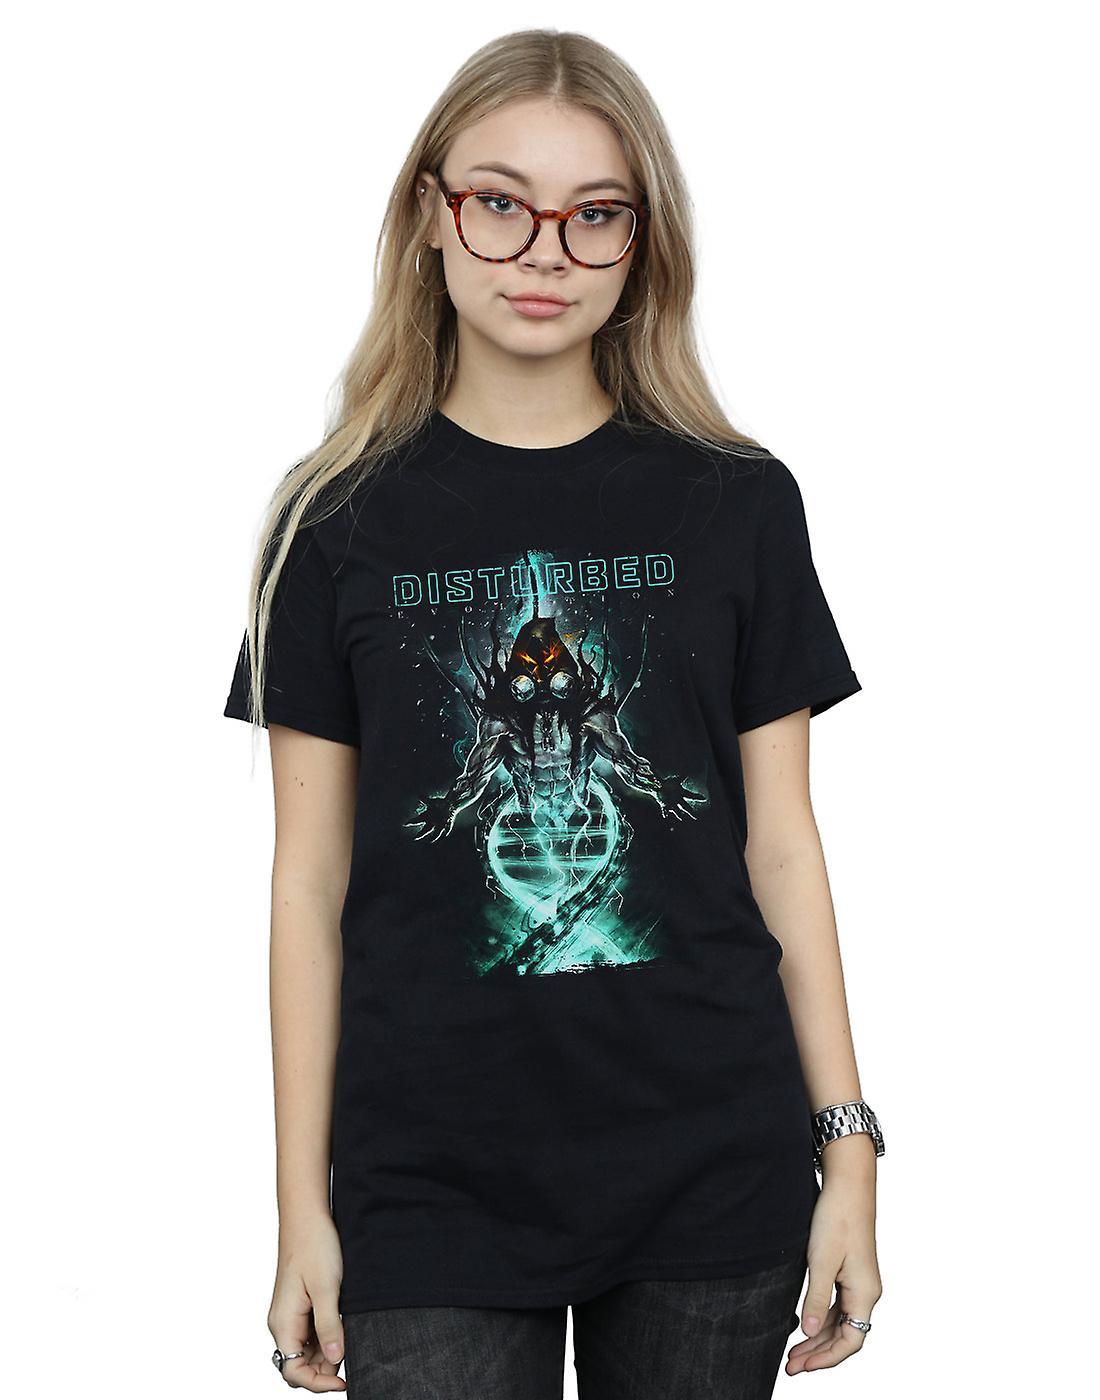 Disturbed Women's Evolving Creature Boyfriend Fit T-Shirt